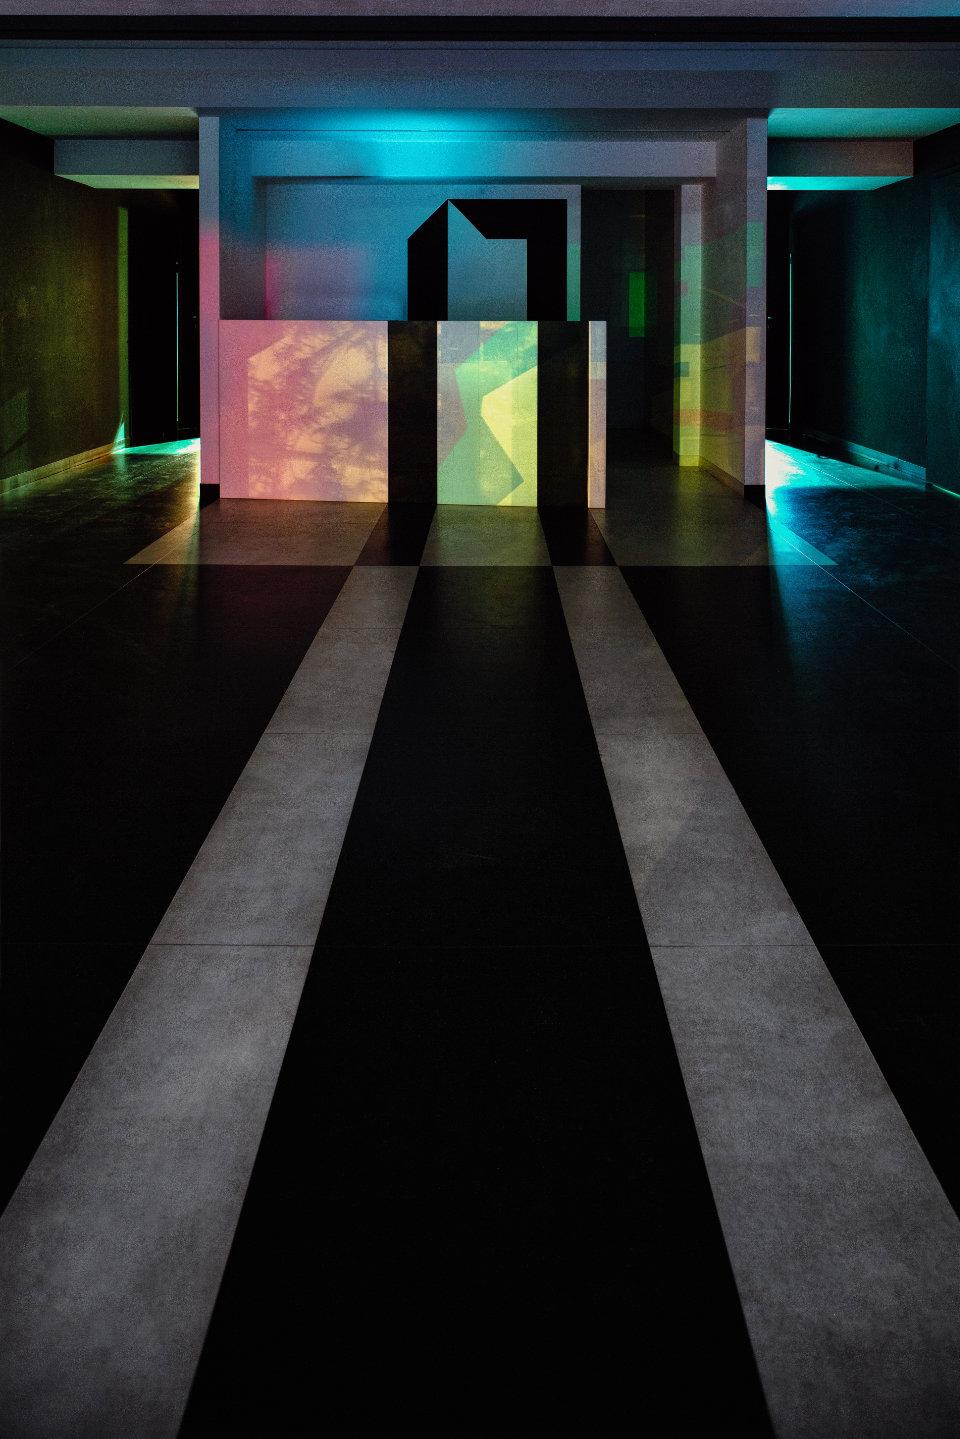 M17 Contemporary Art Center entrance